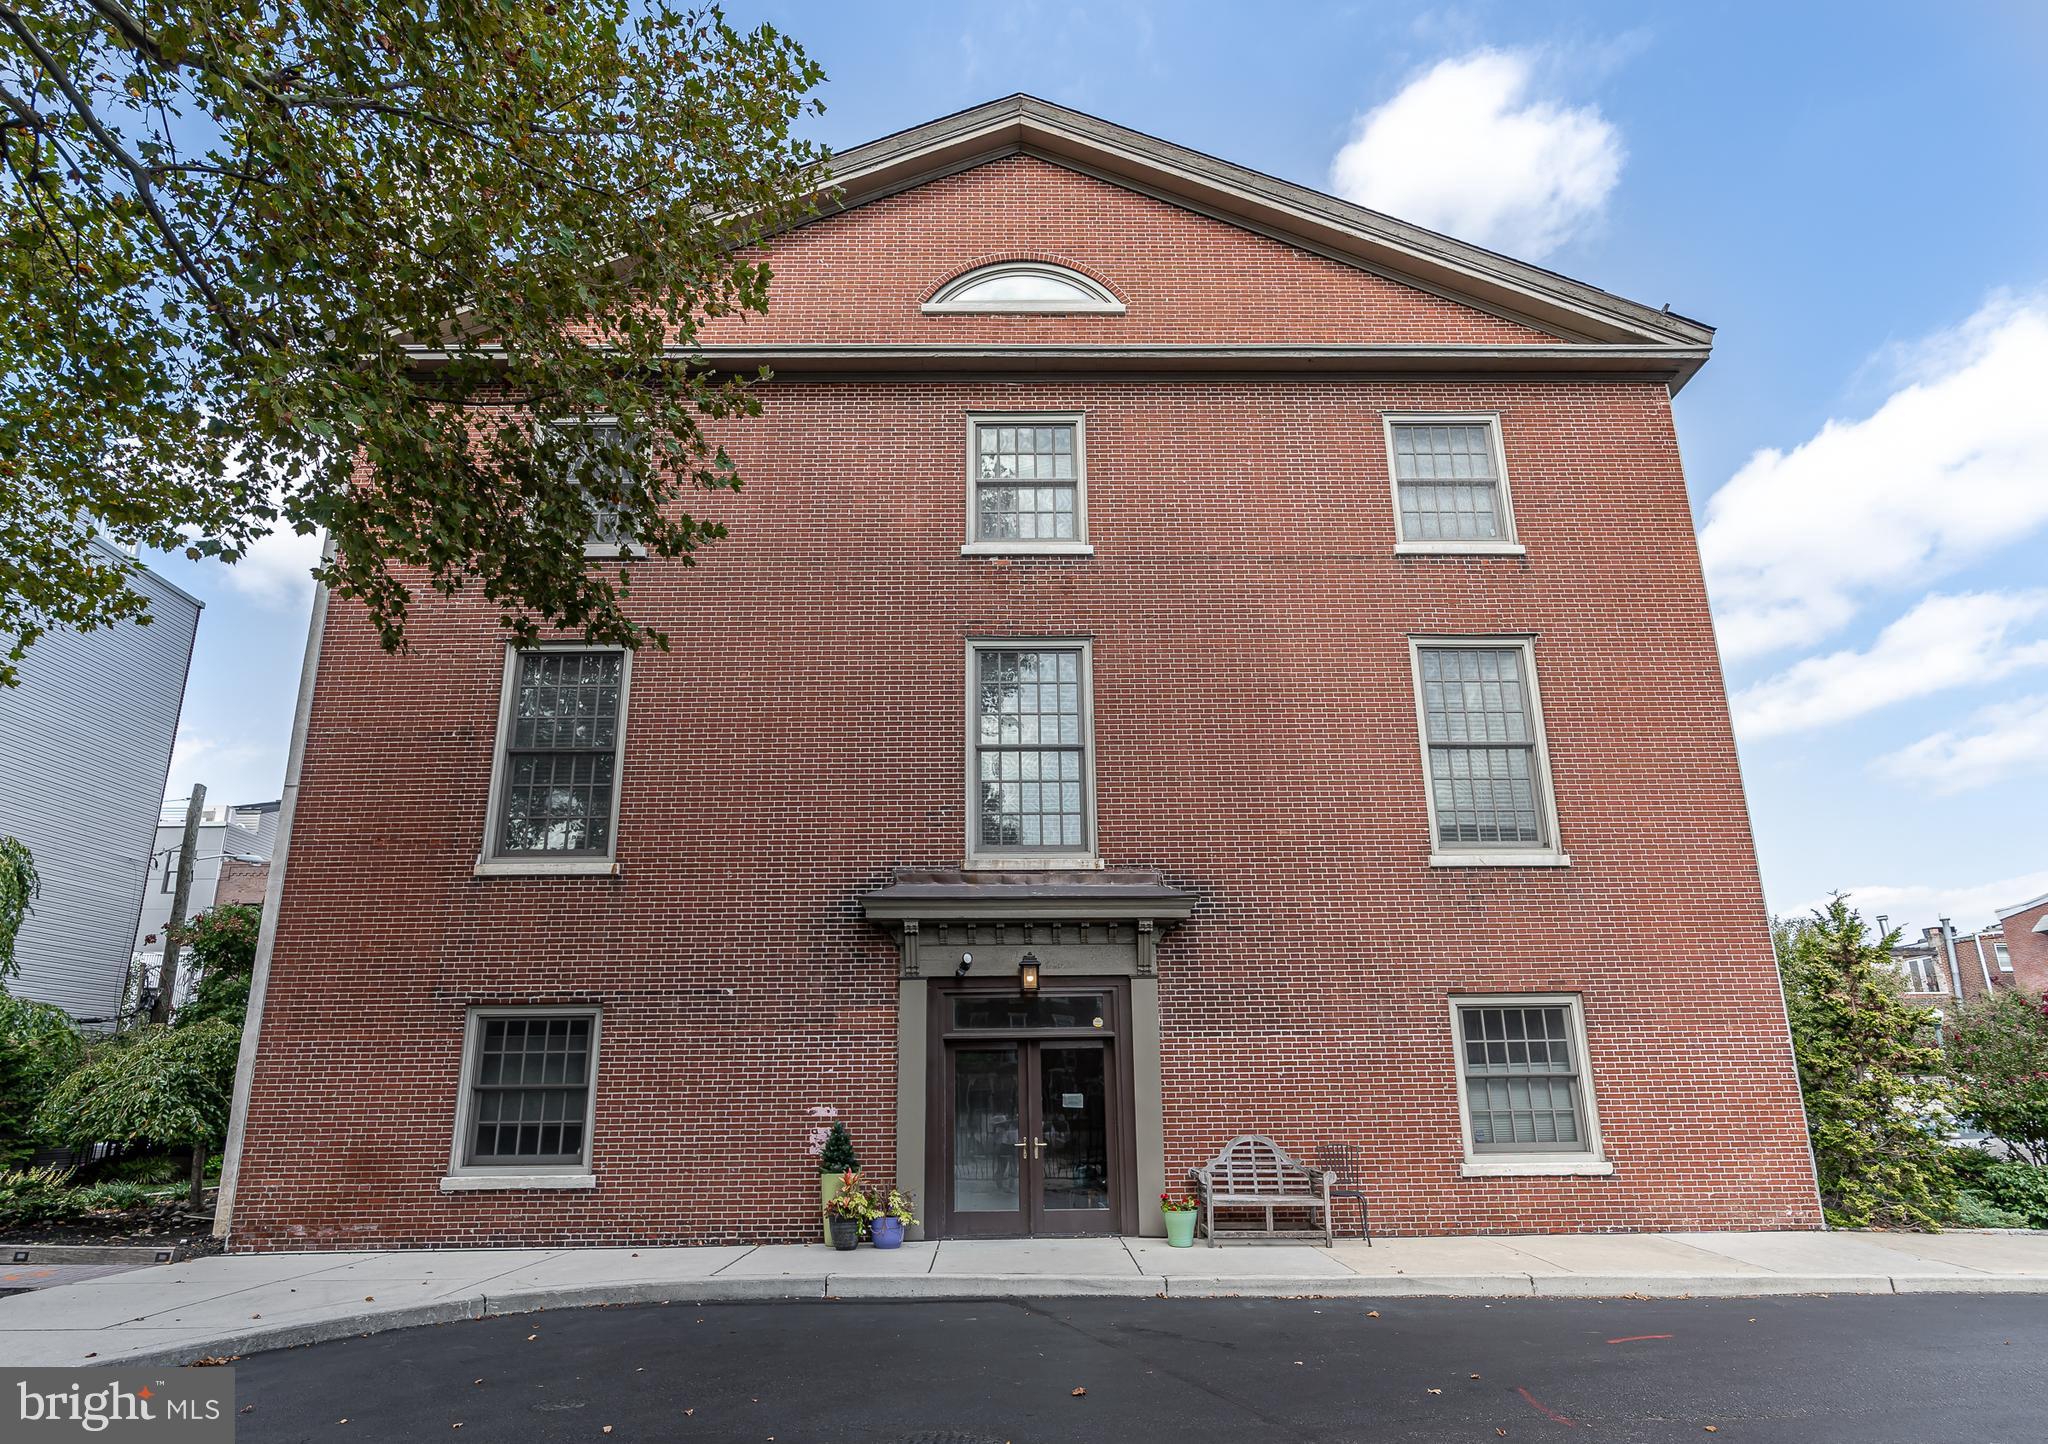 619 CATHARINE St #C2, Philadelphia, PA, 19147